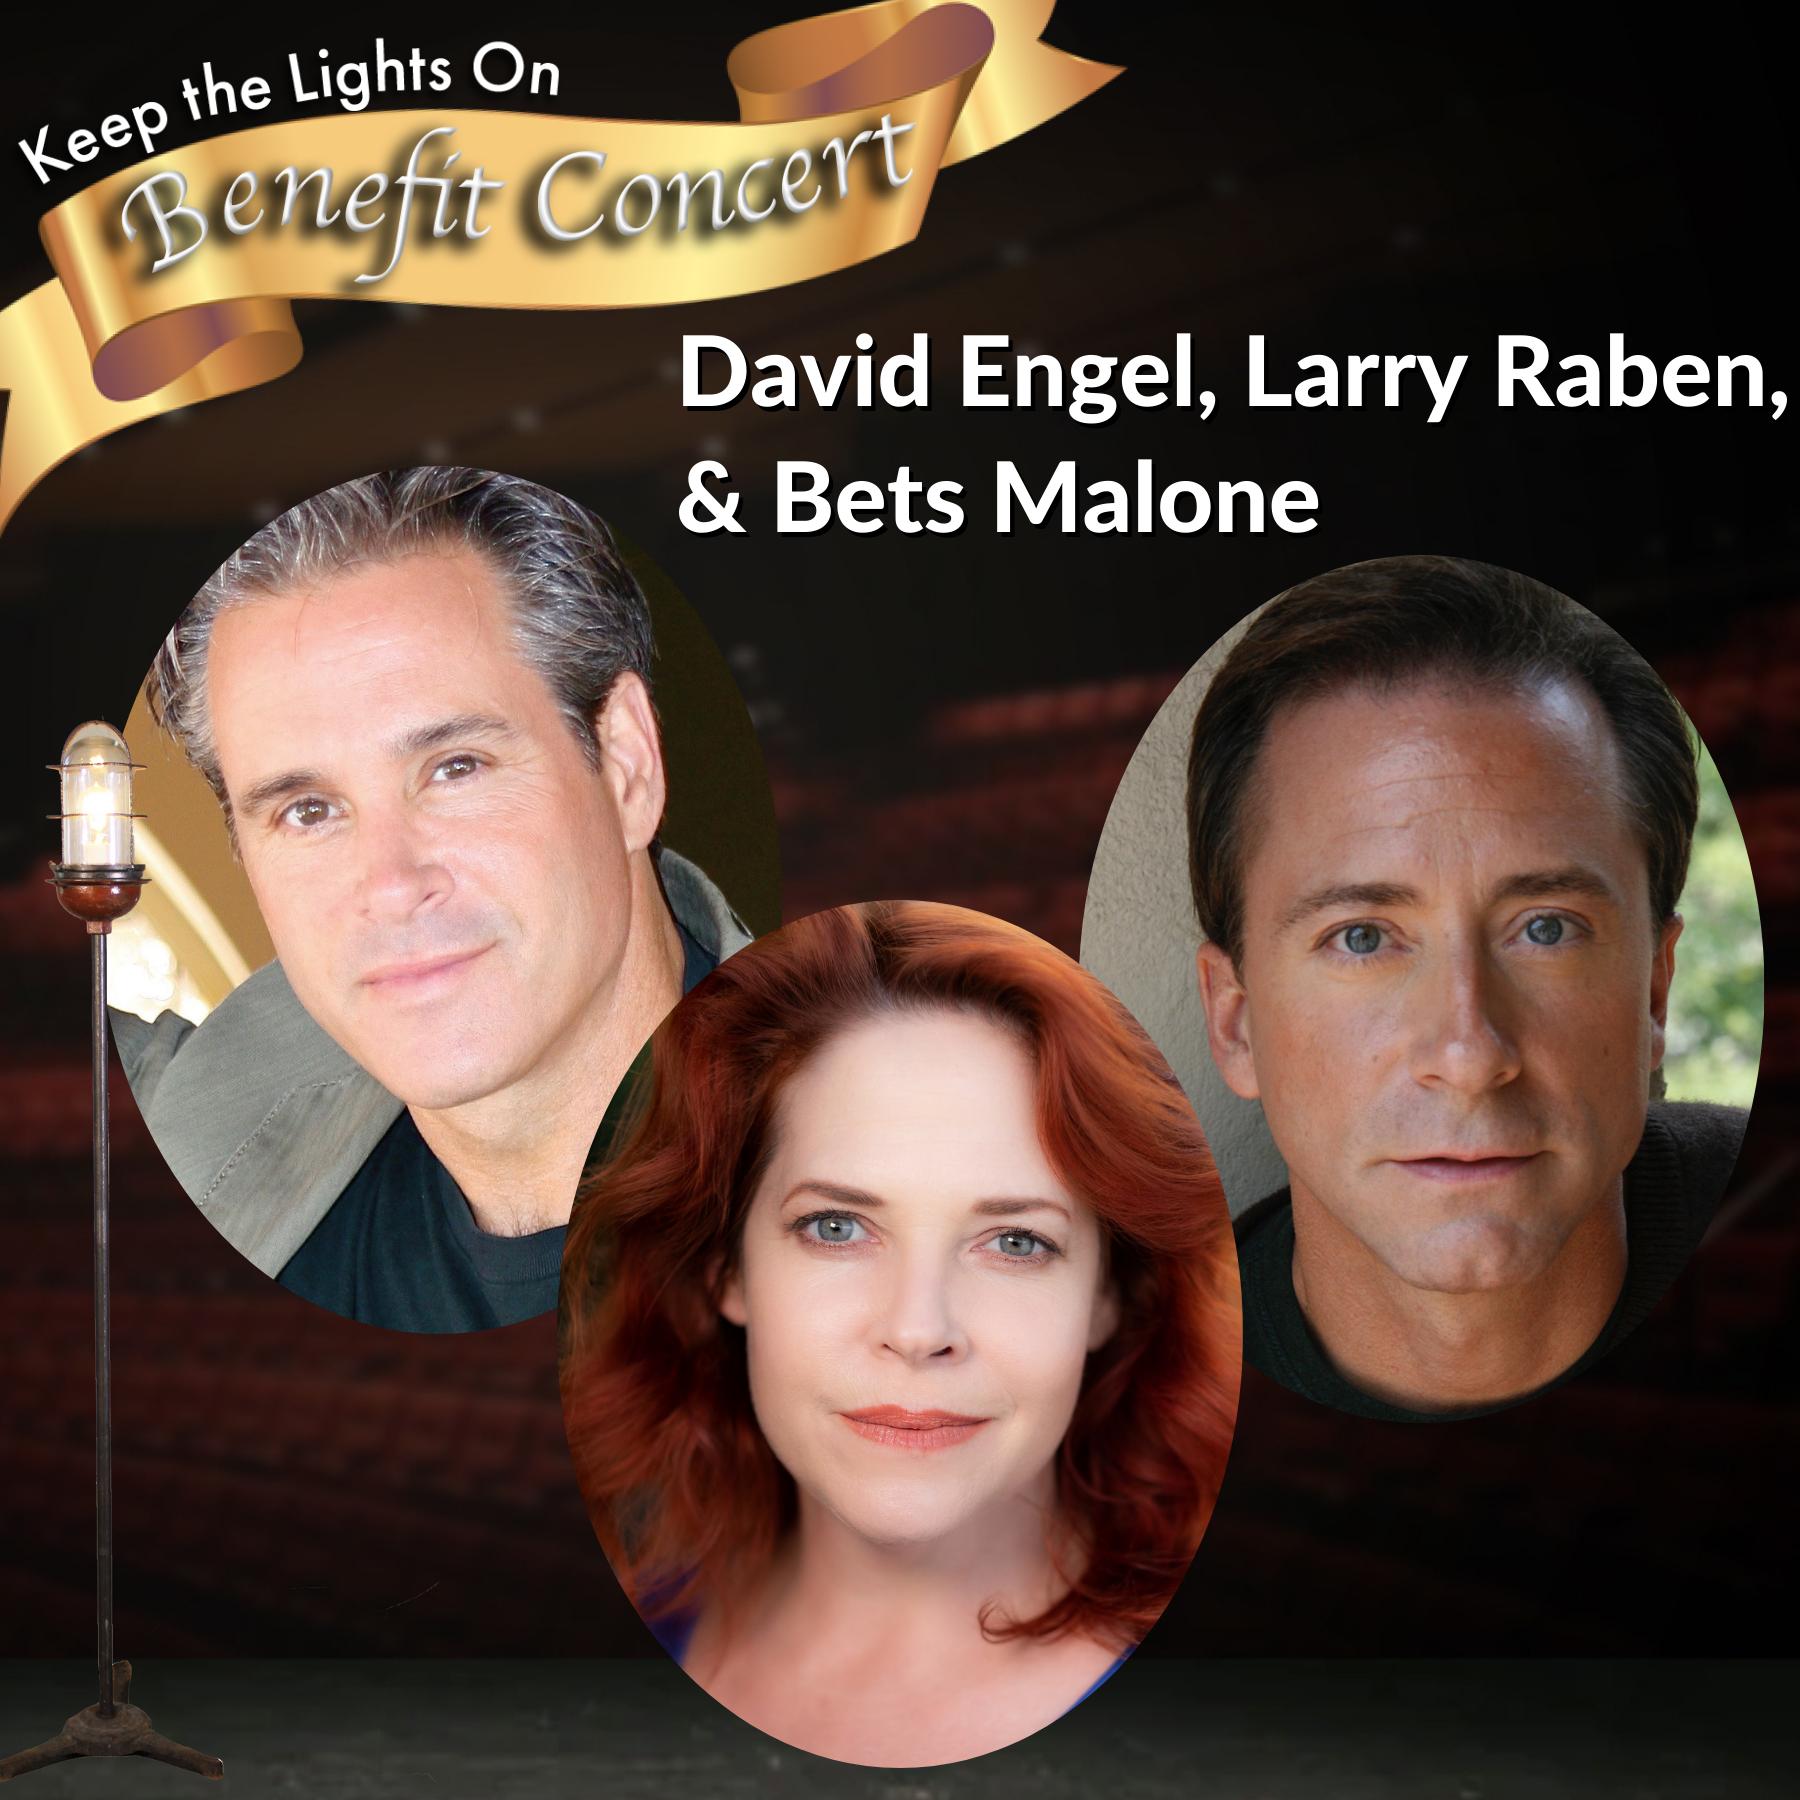 David, Larry & Bets